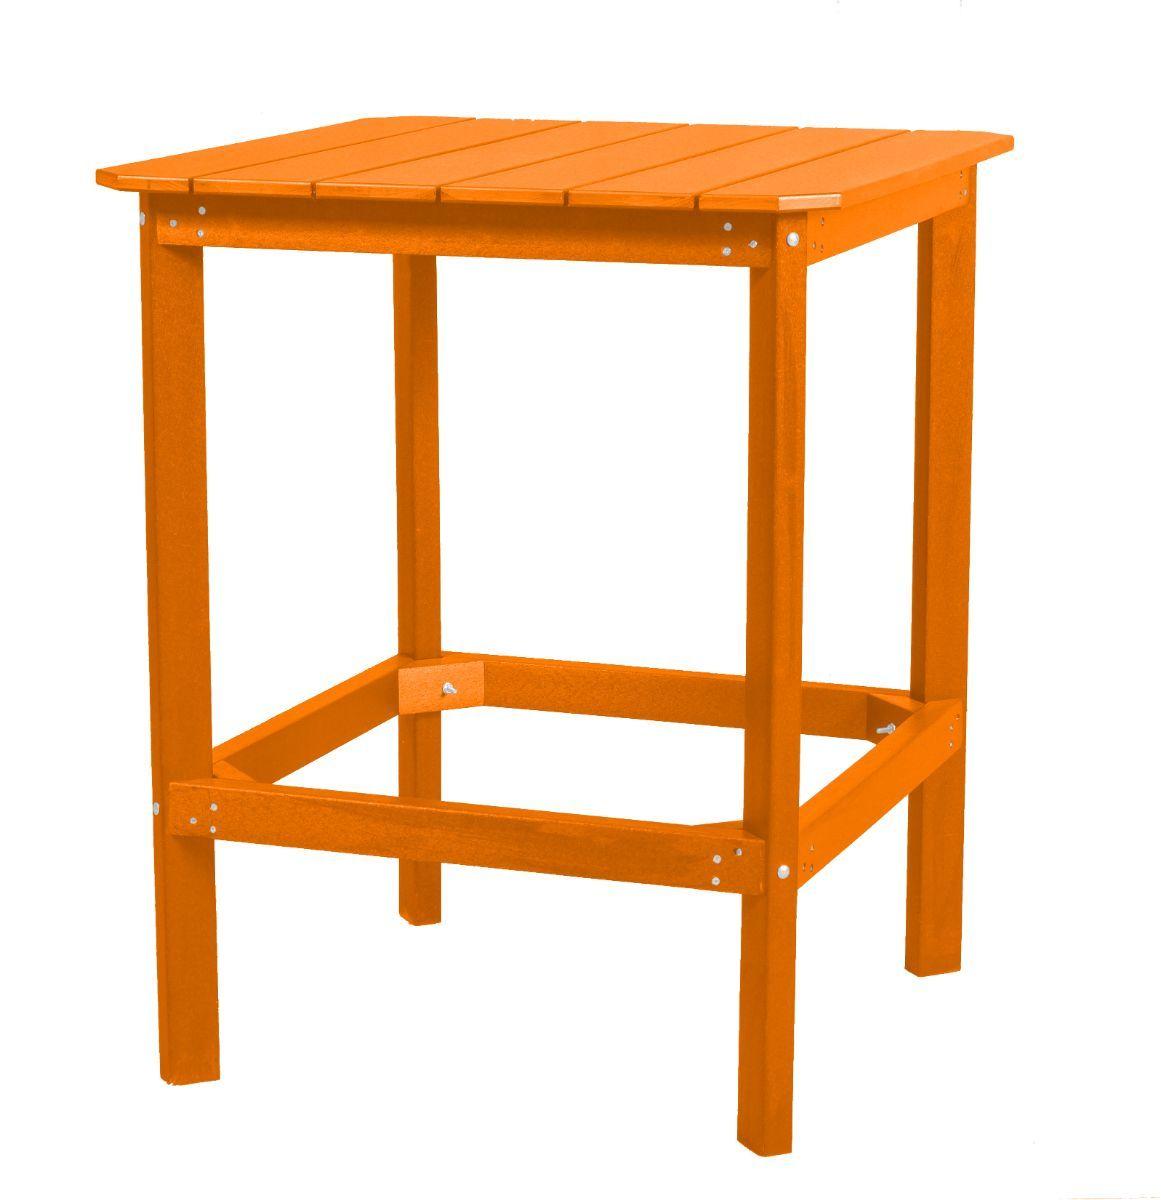 Bright Orange Panama High Outdoor Dining Table